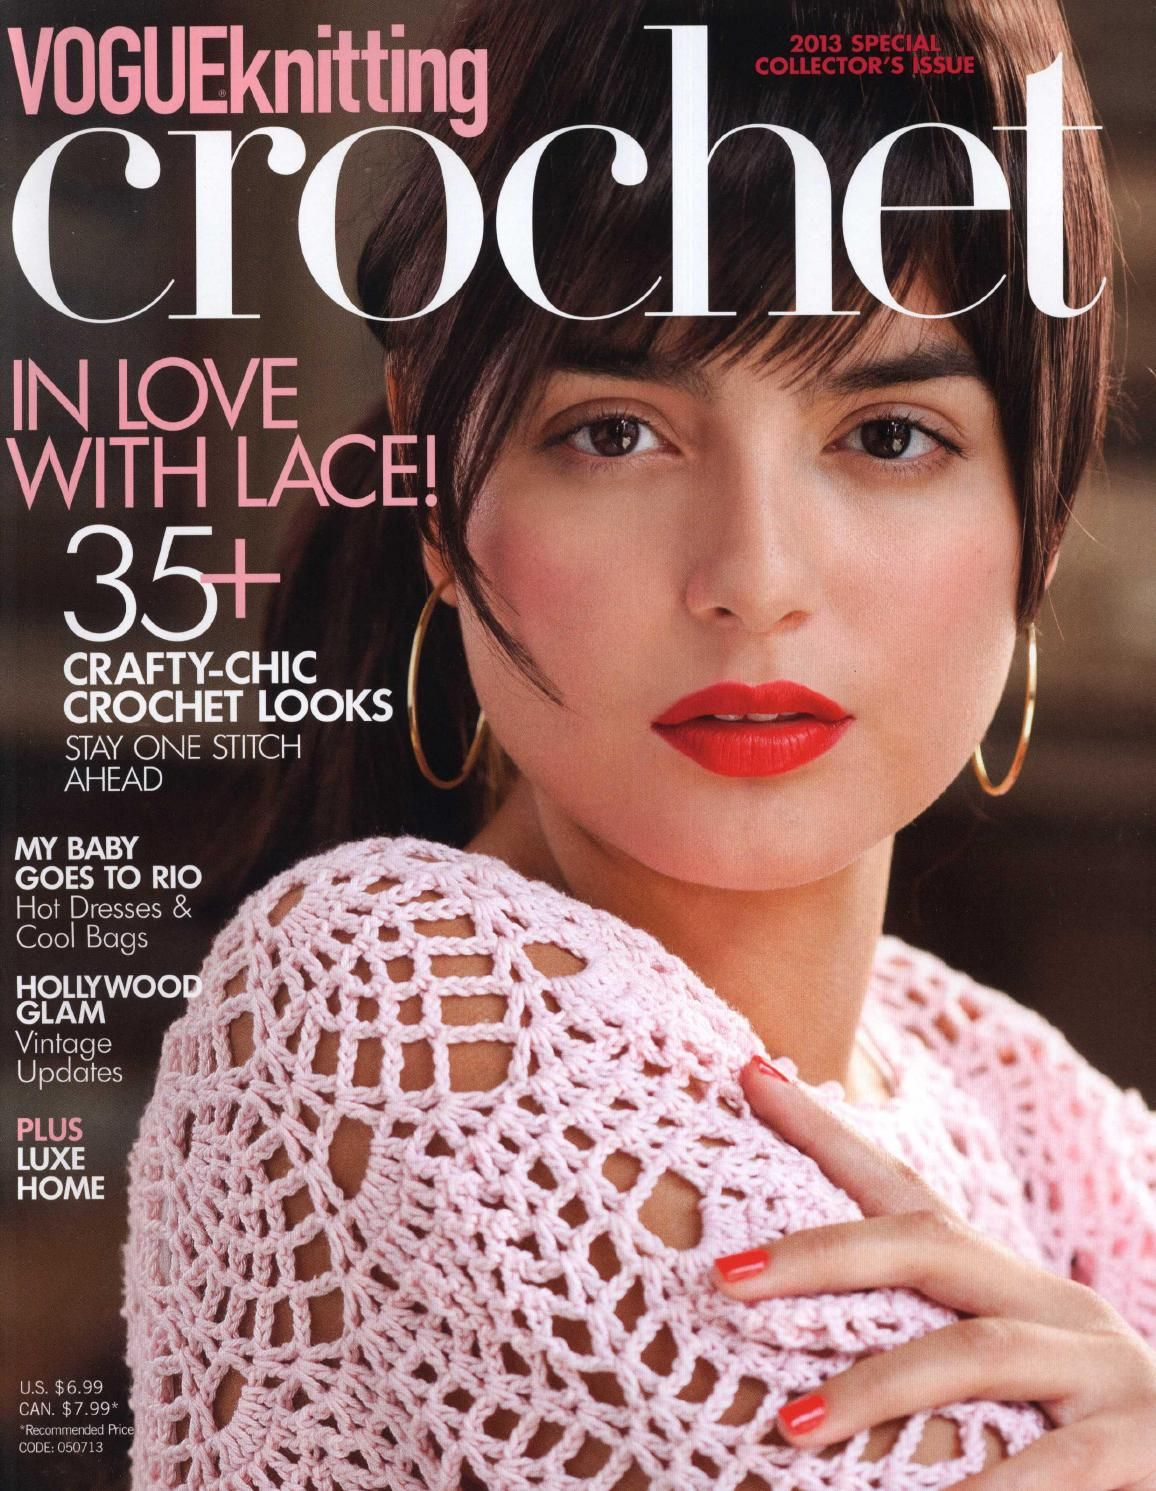 ISSUU - Vogue Knitting Crochet 2013 by english1to1...